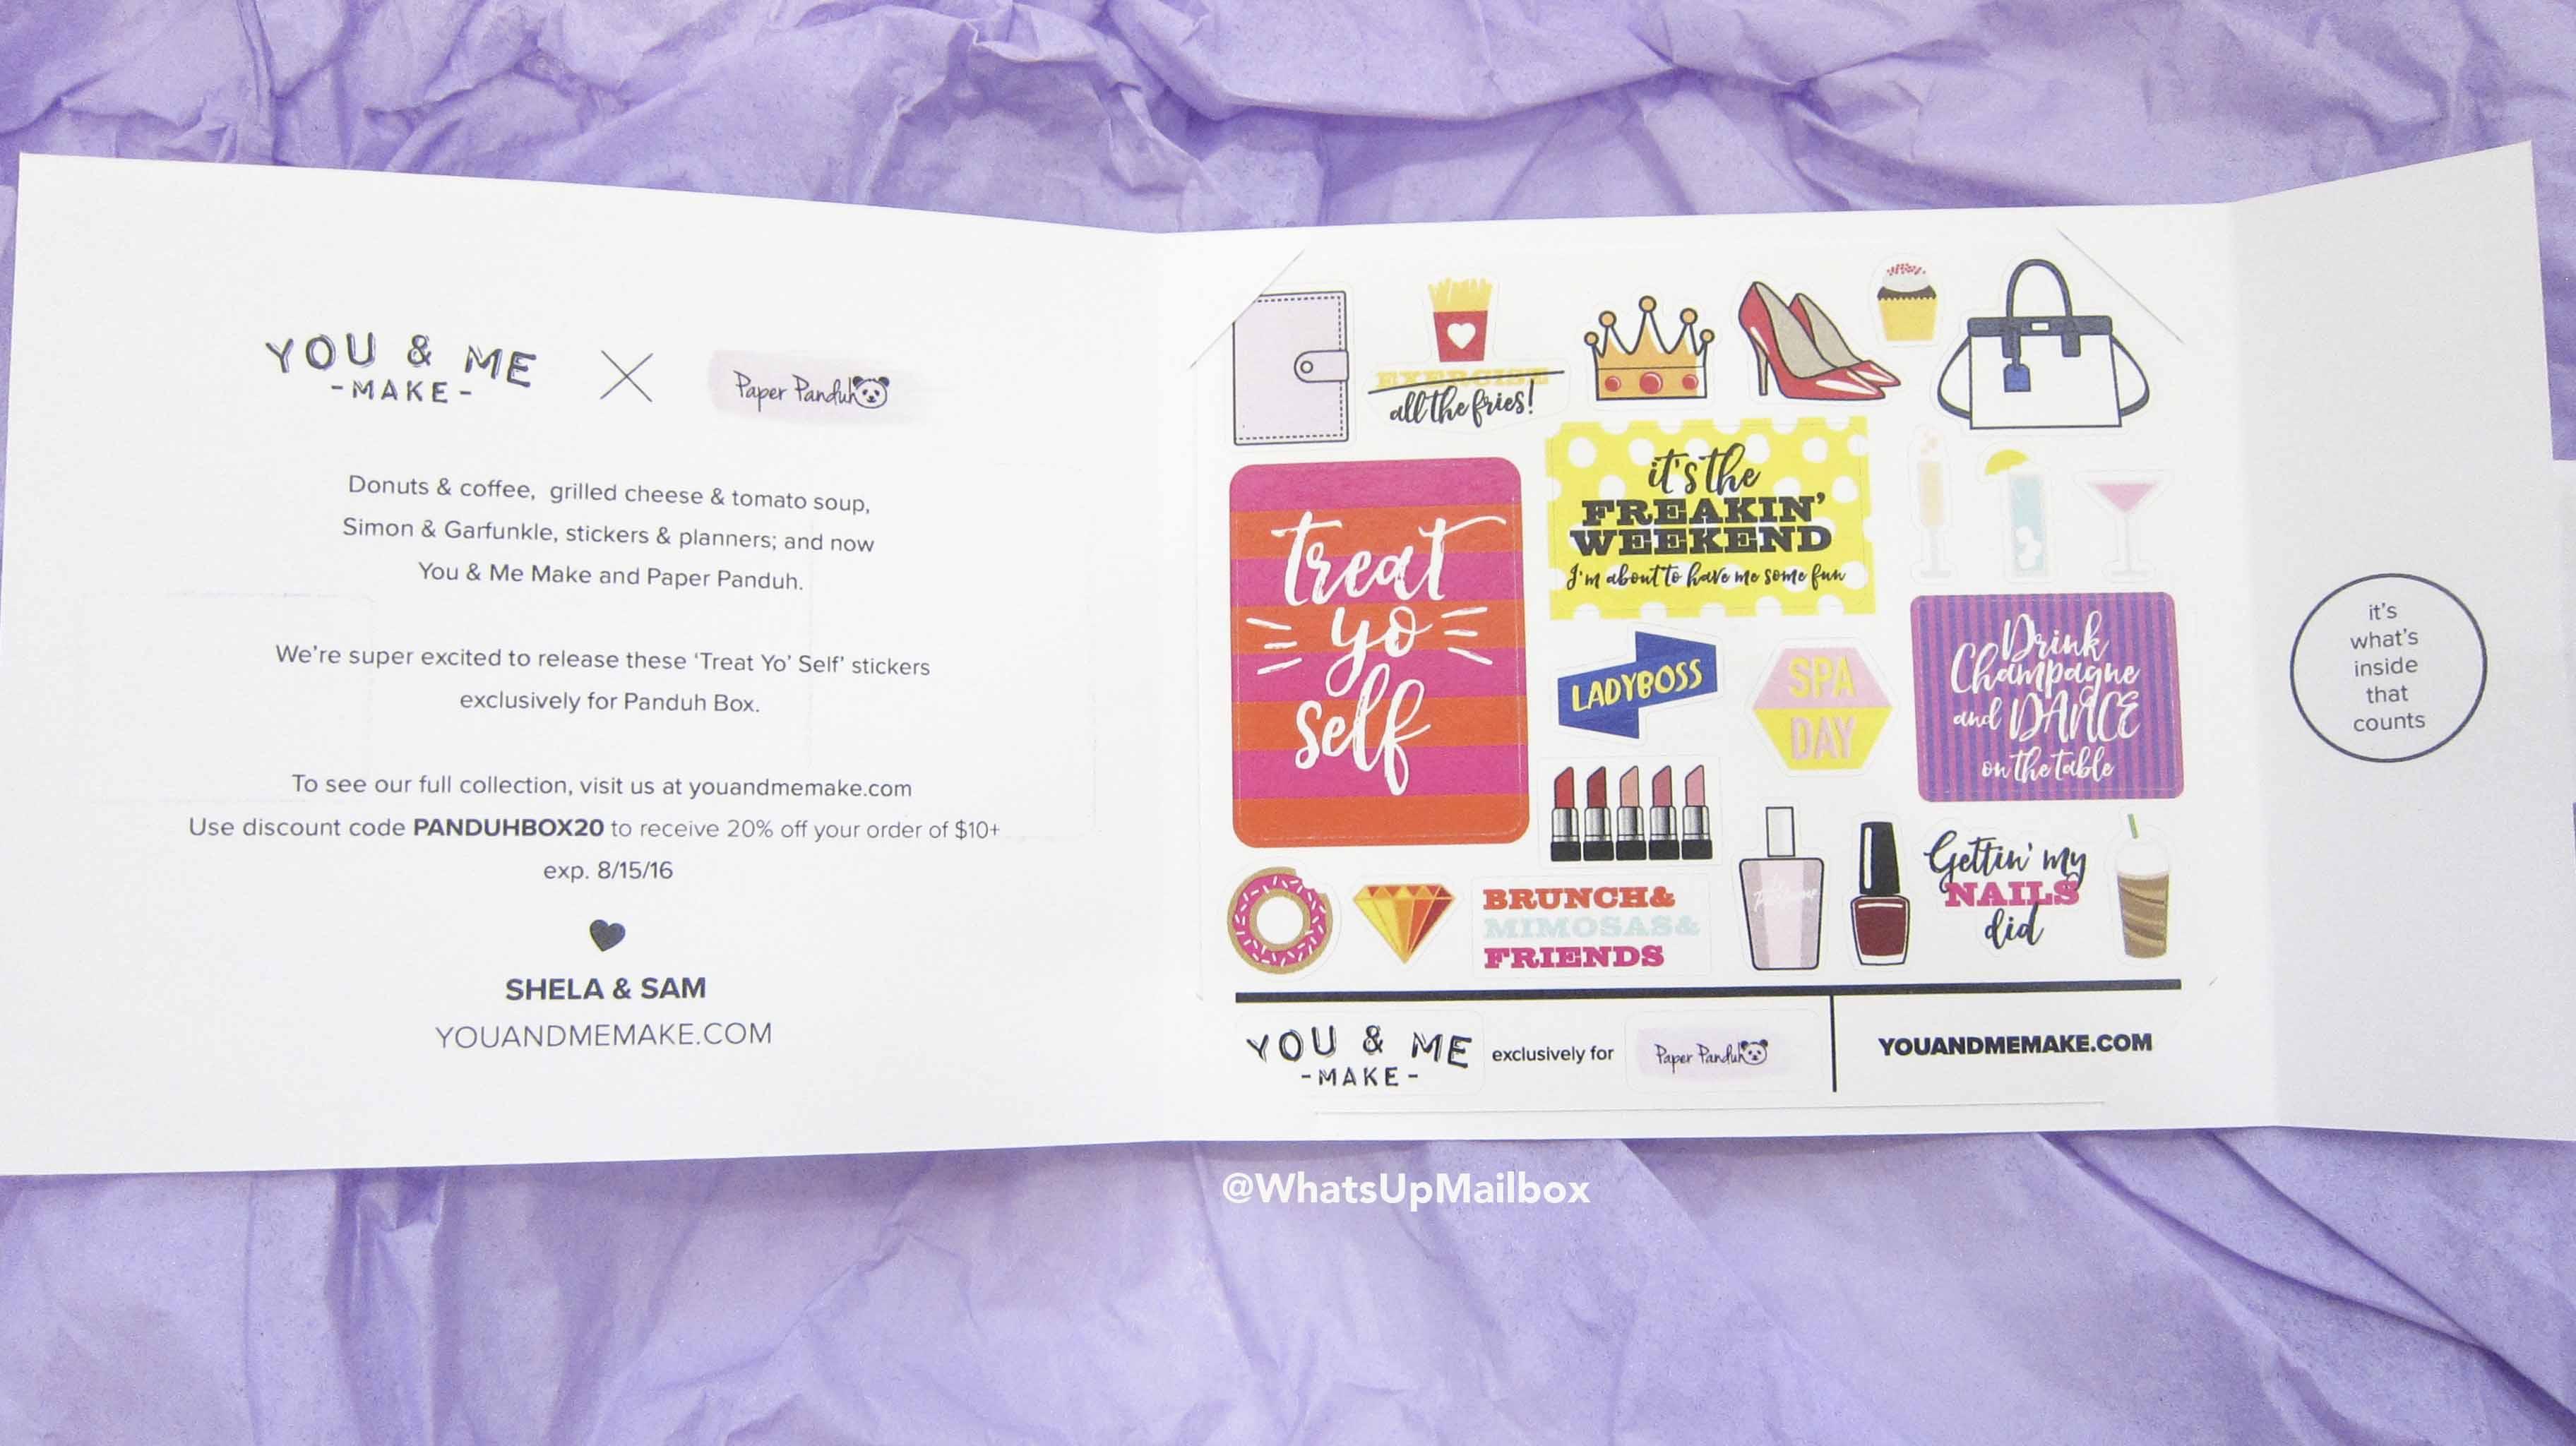 Panduh Box July 2016 - You & Me Make Bonus Stickers